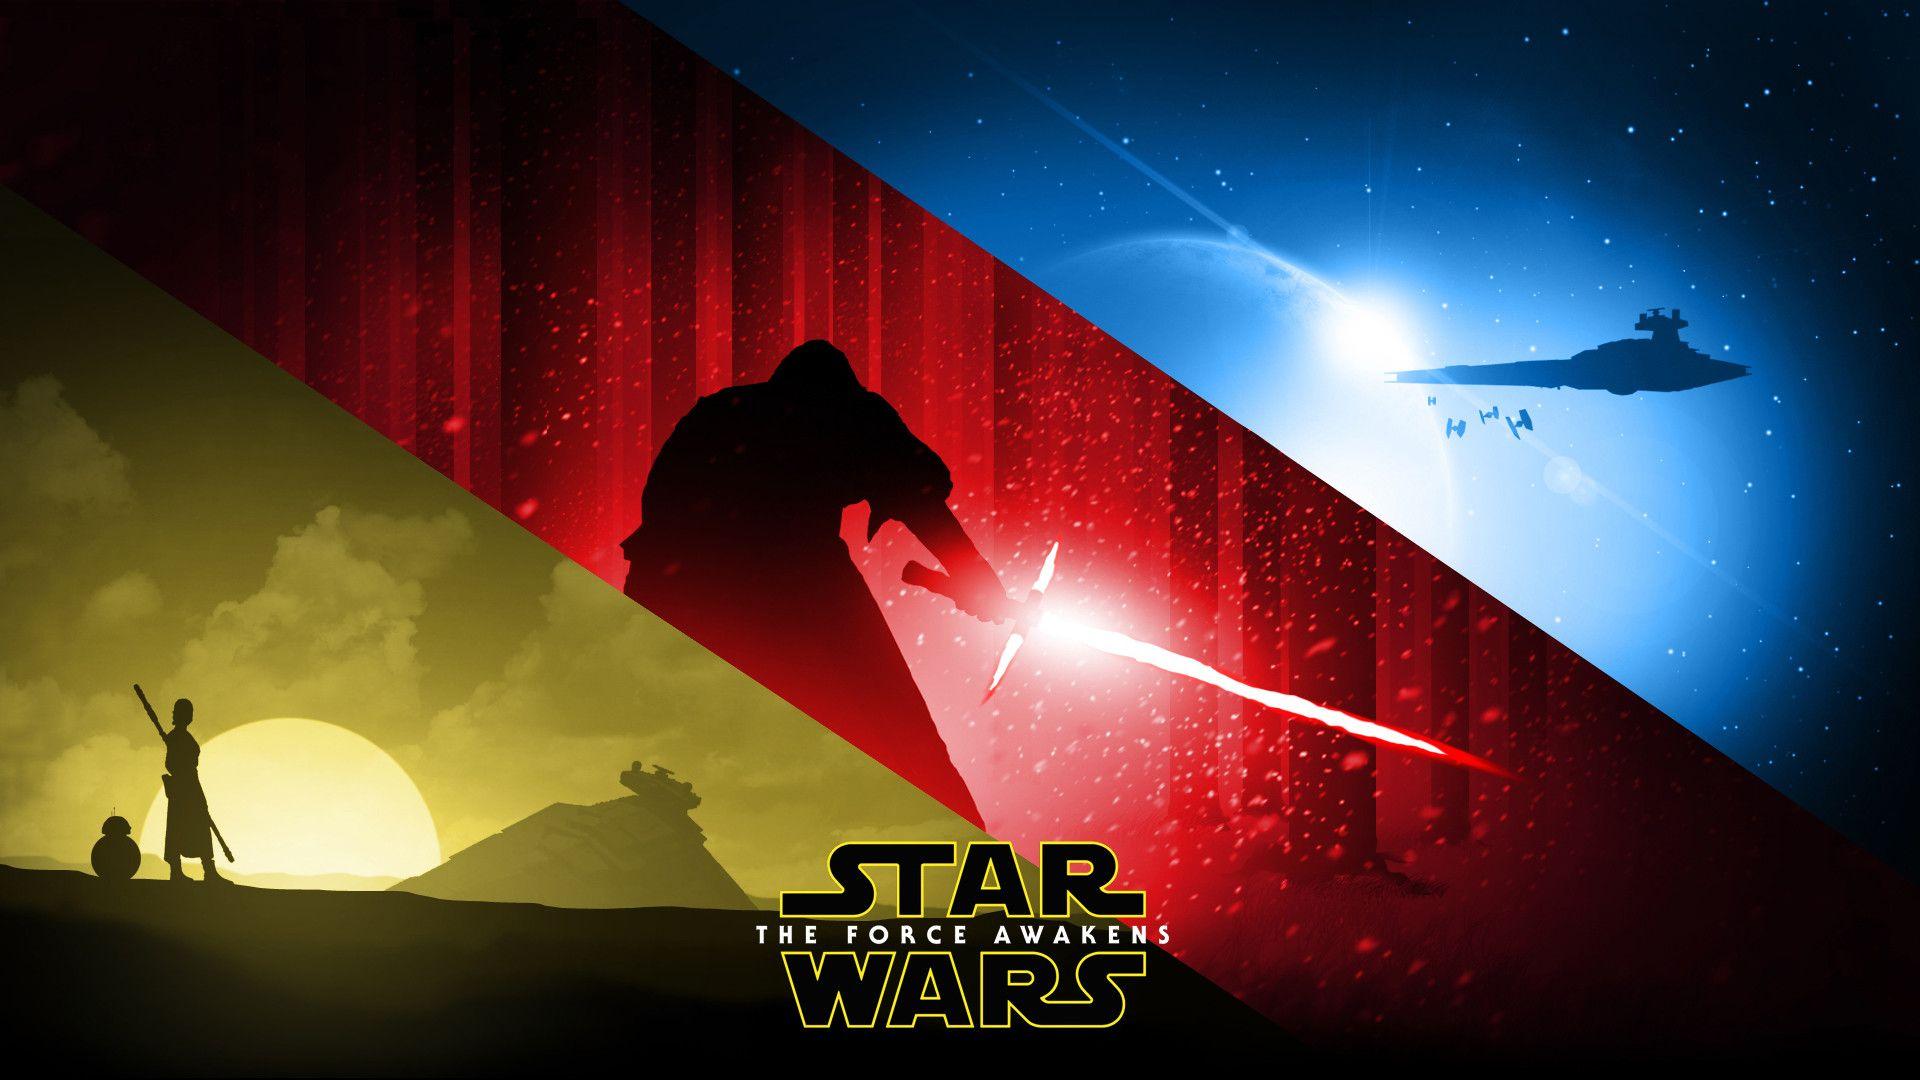 Star Wars Sith Empire Wallpaper Images Click Wallpapers Star Wars Background Star Wars Sith Empire Star Wars Wallpaper